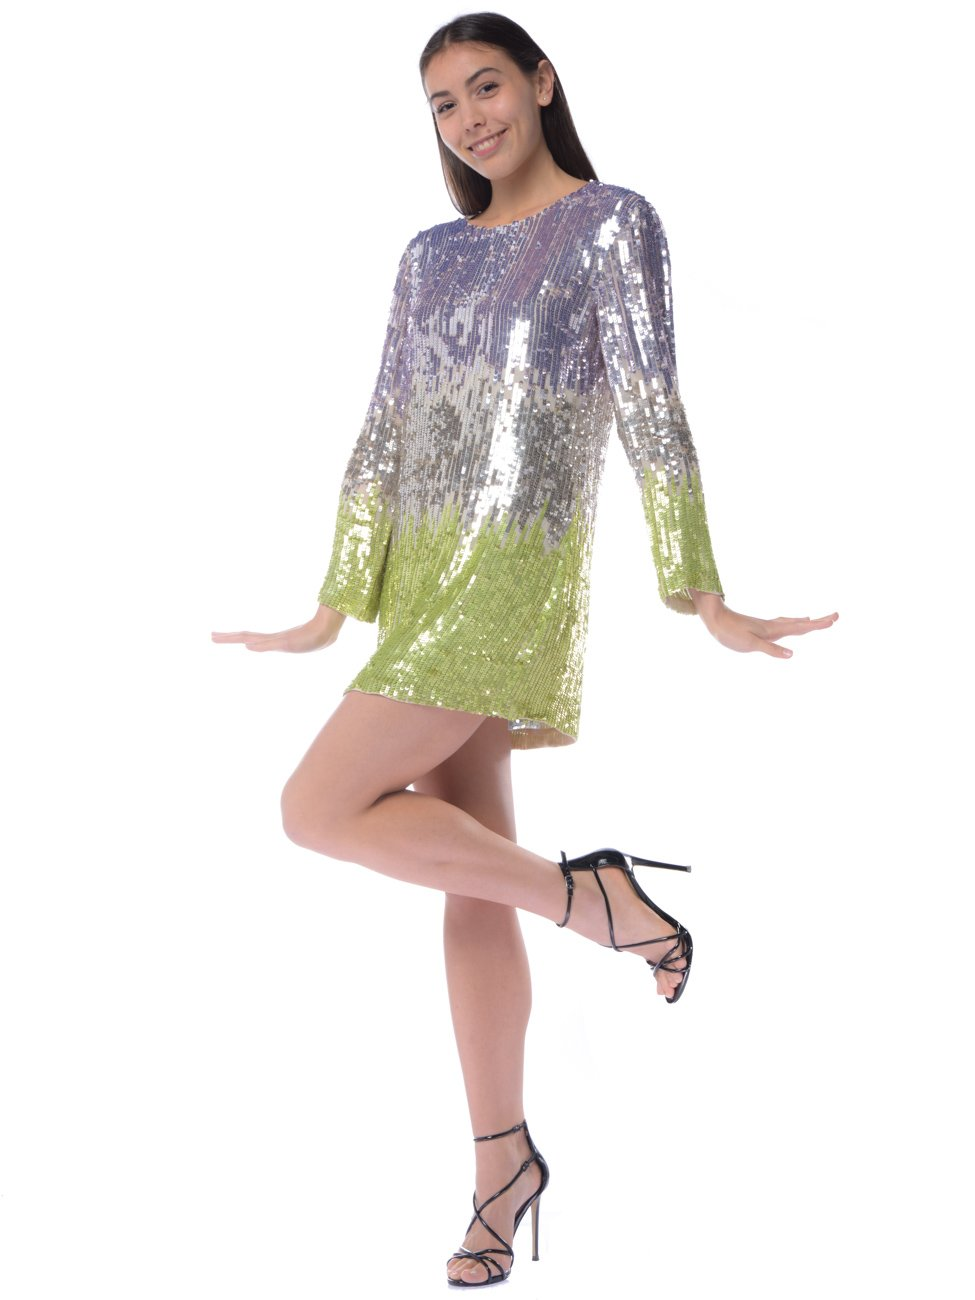 af31bc81cfea Roncastyle - Fashion Store Multibrand